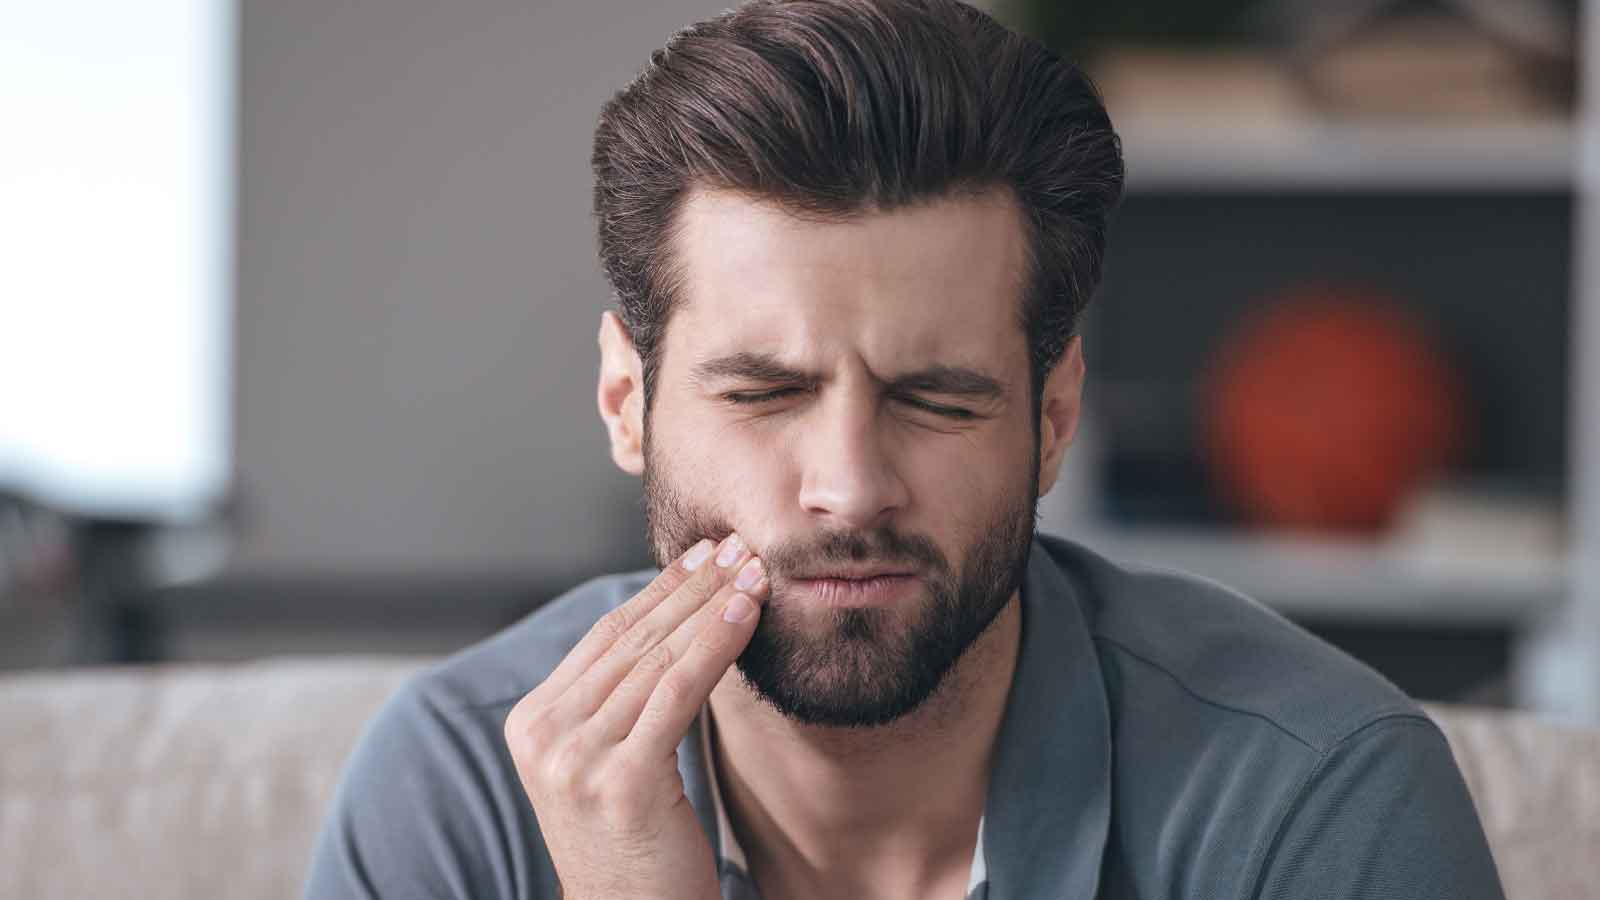 impianto dentale fallito news giugno2021